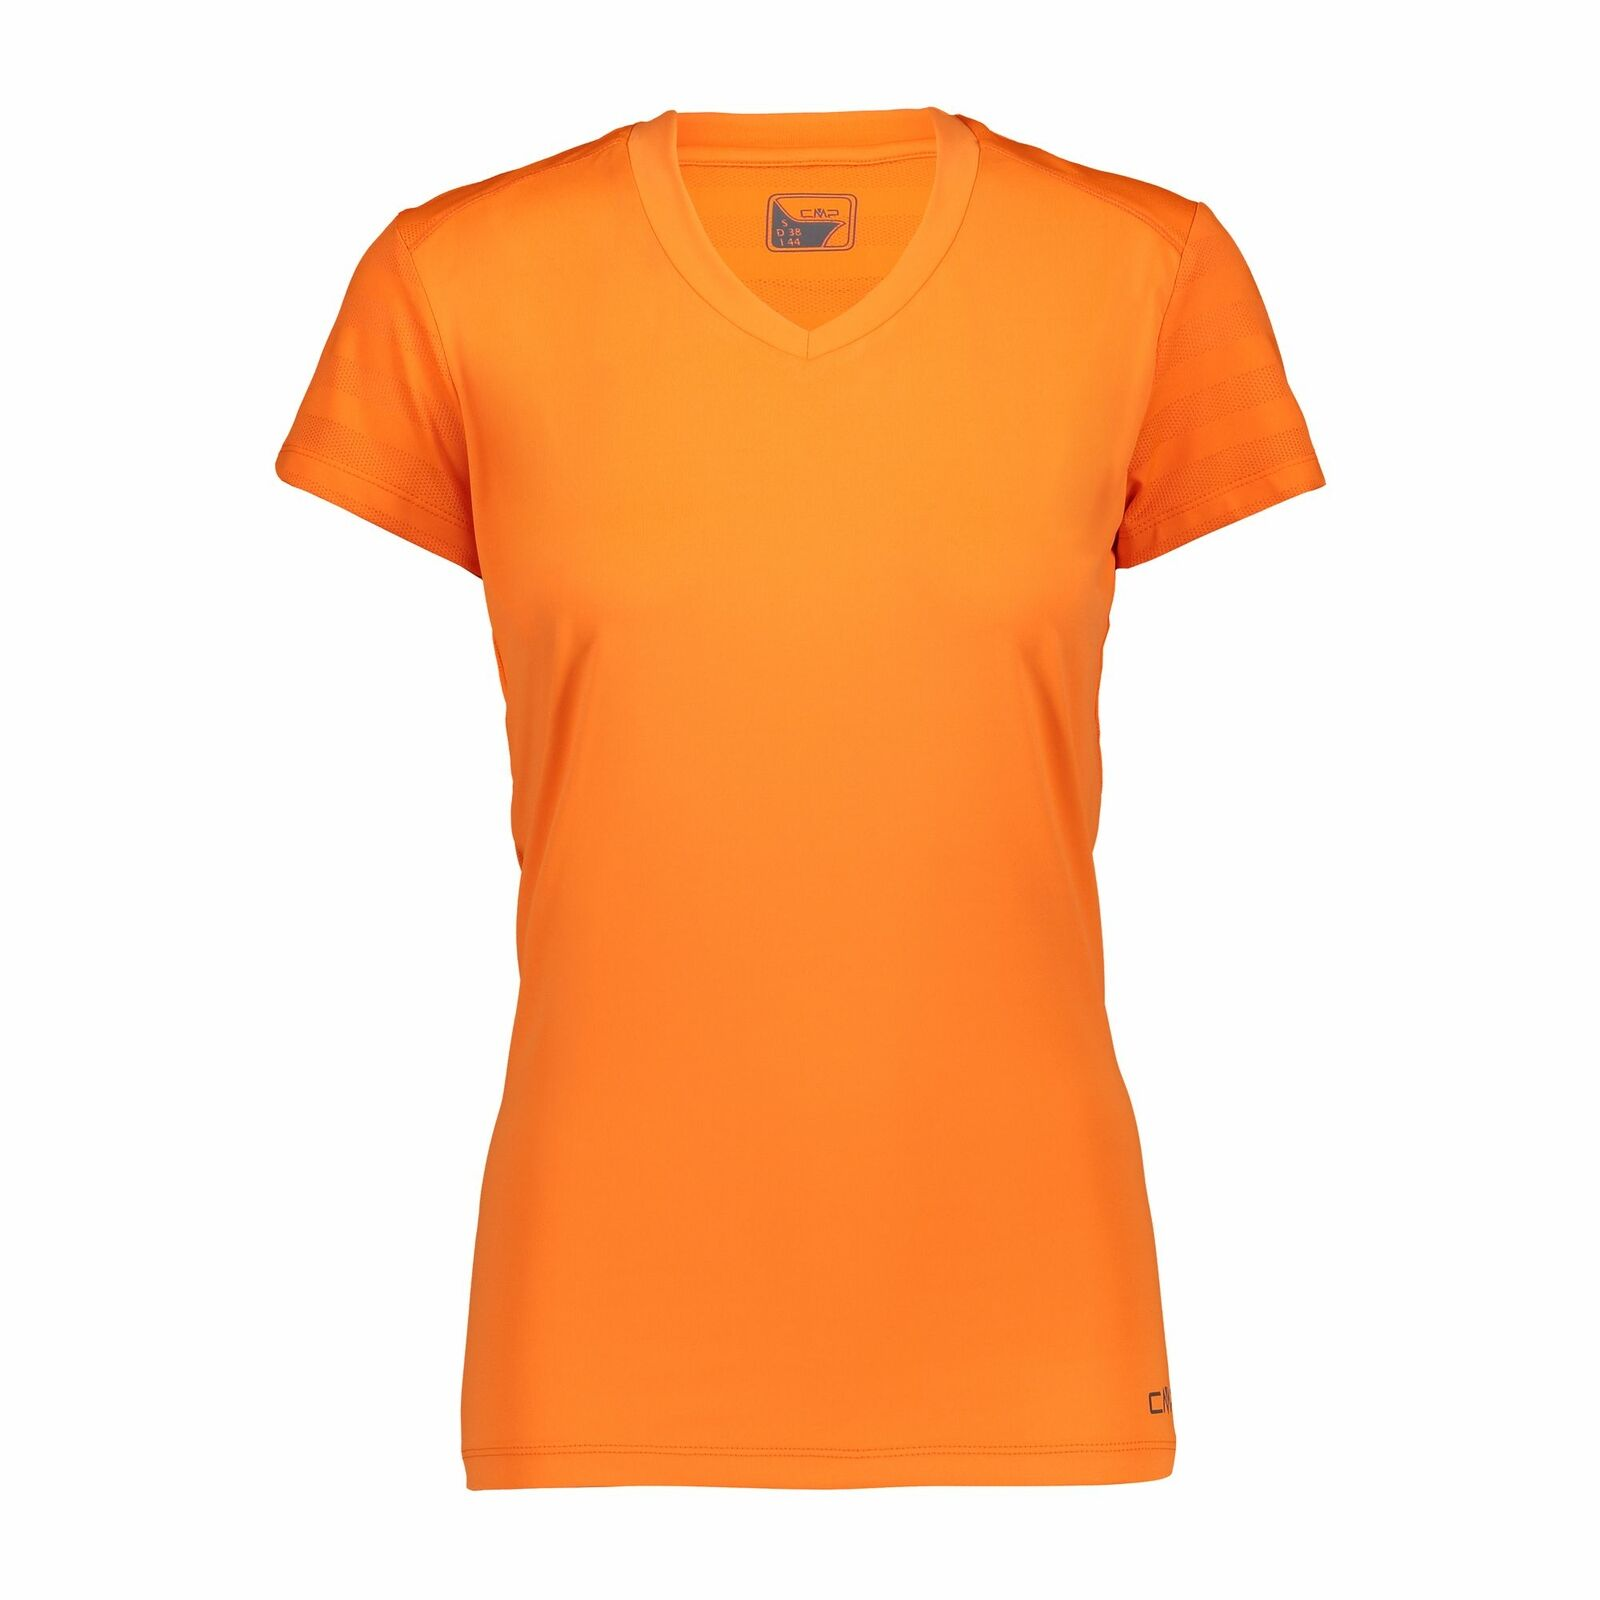 CMP Kleid Shirt Frau T-Shirt Orange Atembare Elastische Ebene Farbe